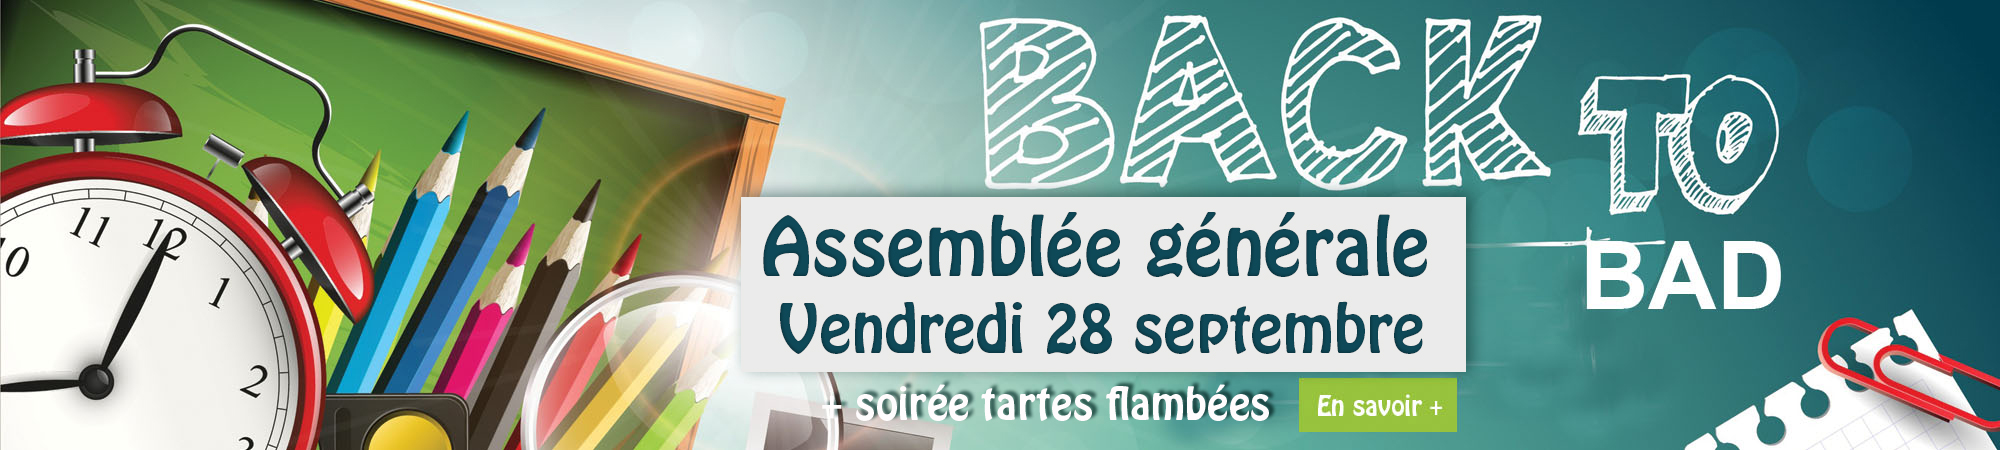 bandeau_assemblee18